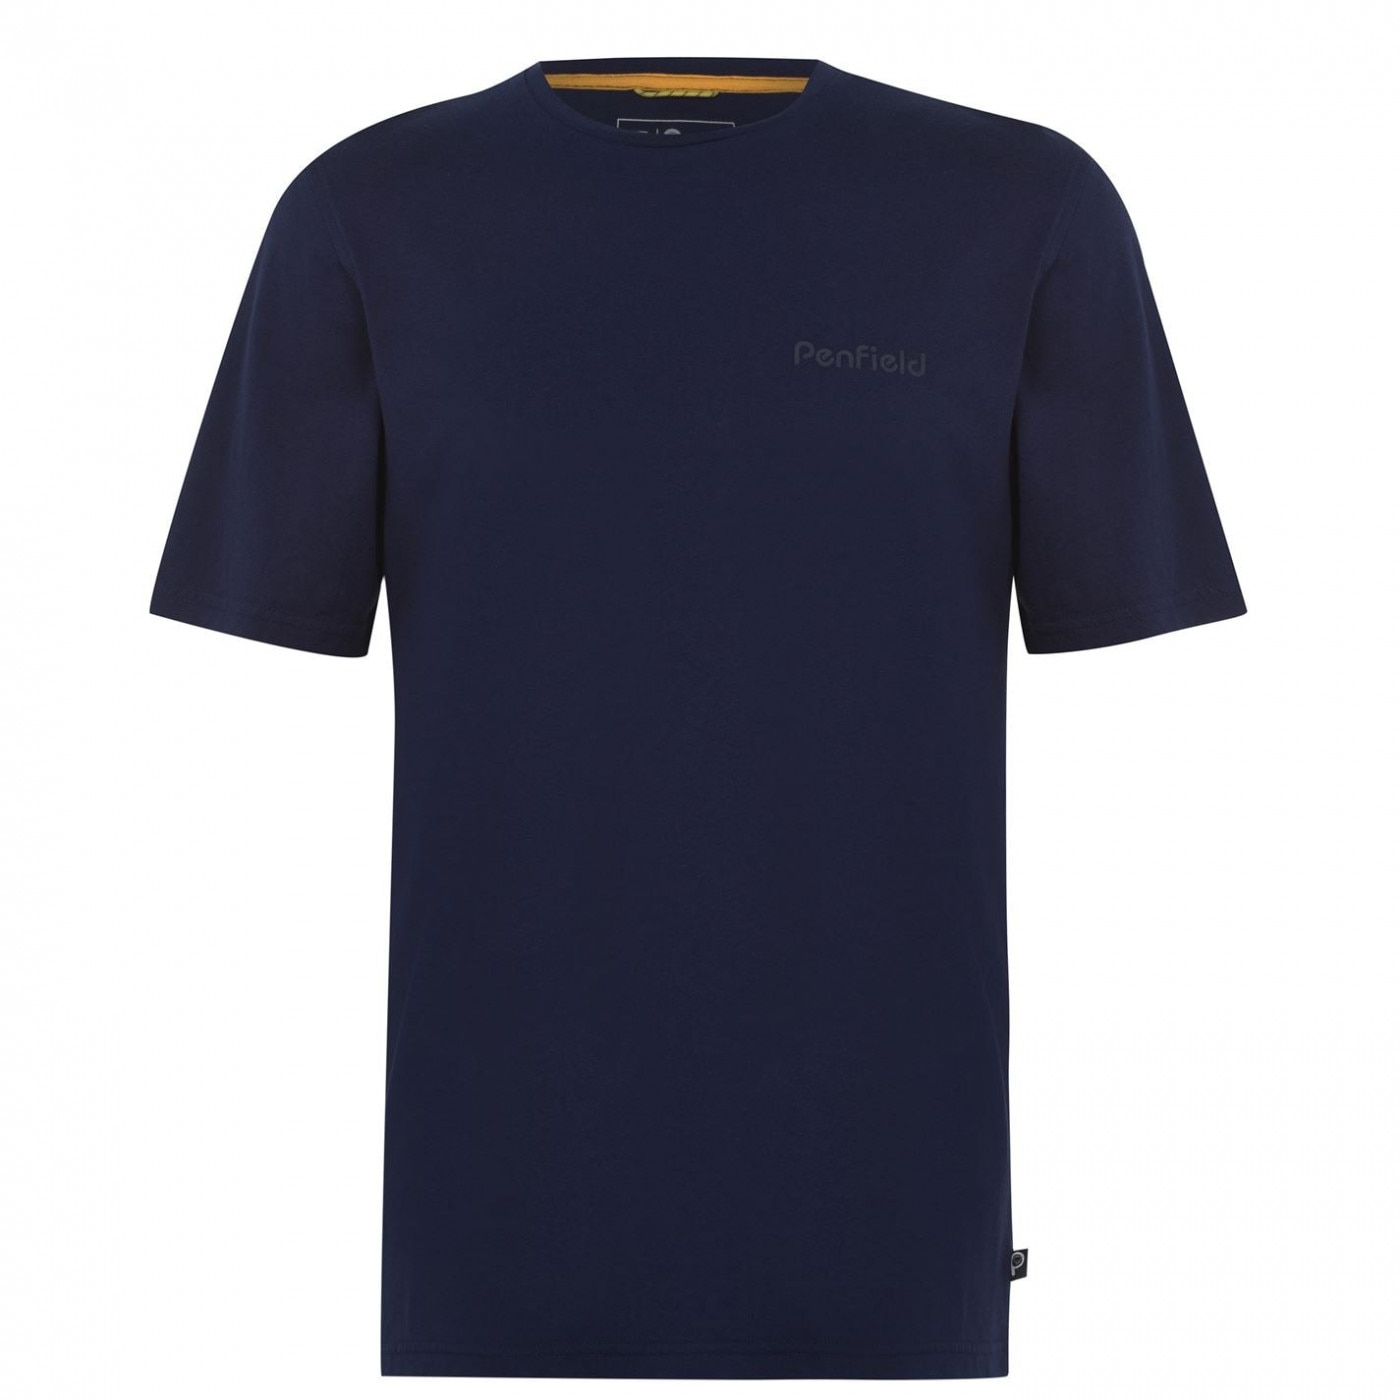 Penfield Wallpole T Shirt